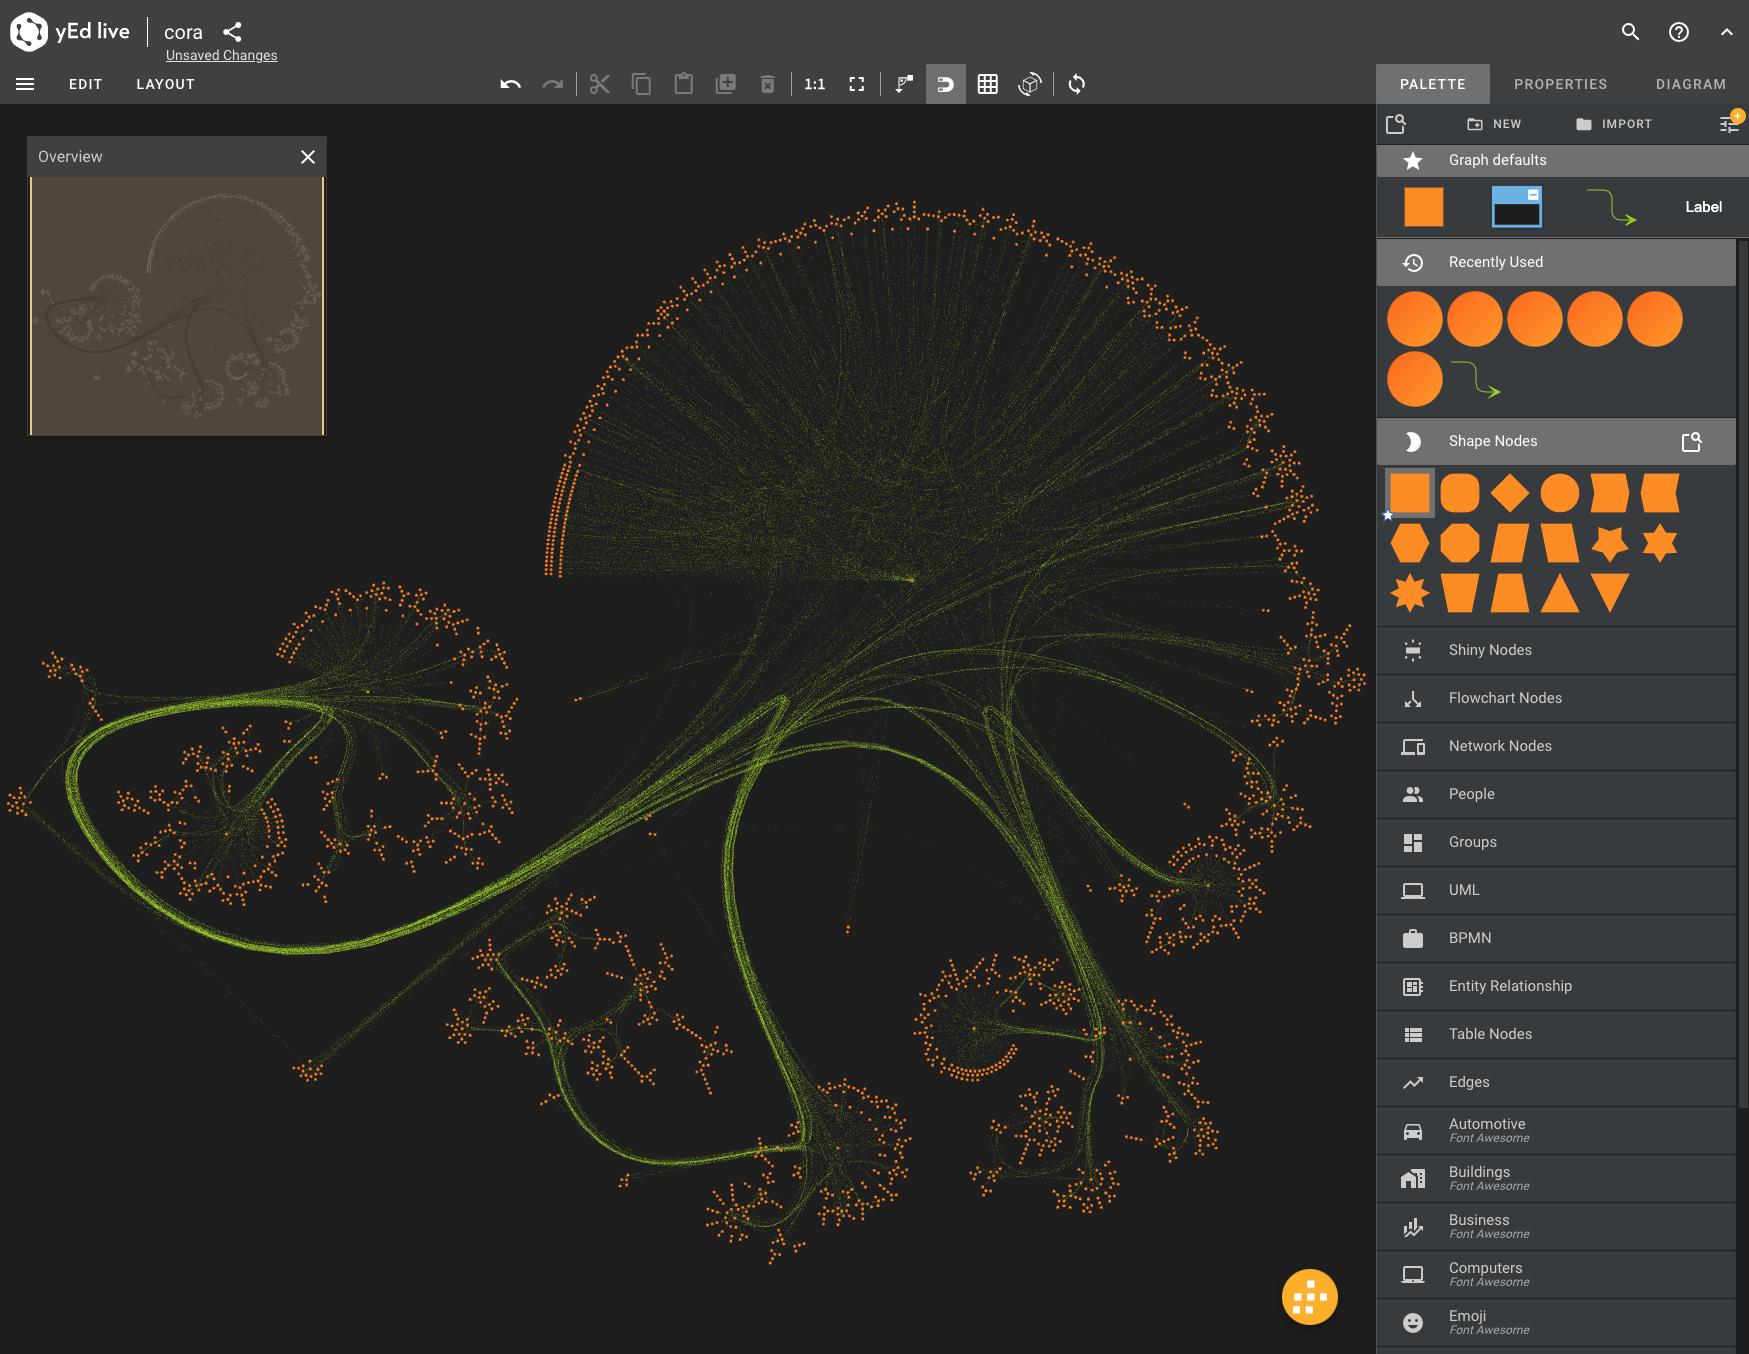 Cora visualization using yEd Online